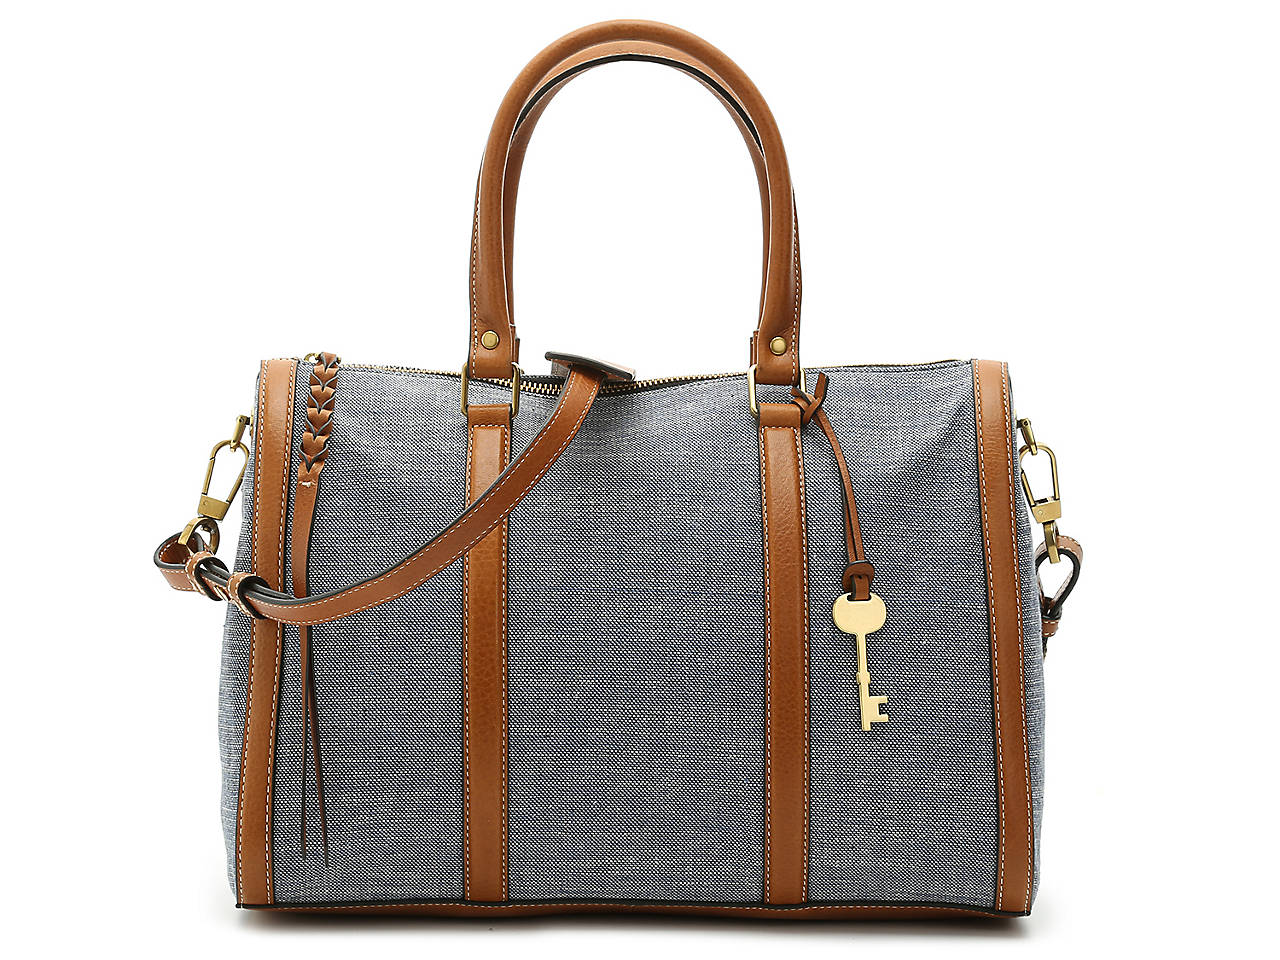 50b98a7f8de2 Fossil Kendall Satchel Women s Handbags   Accessories